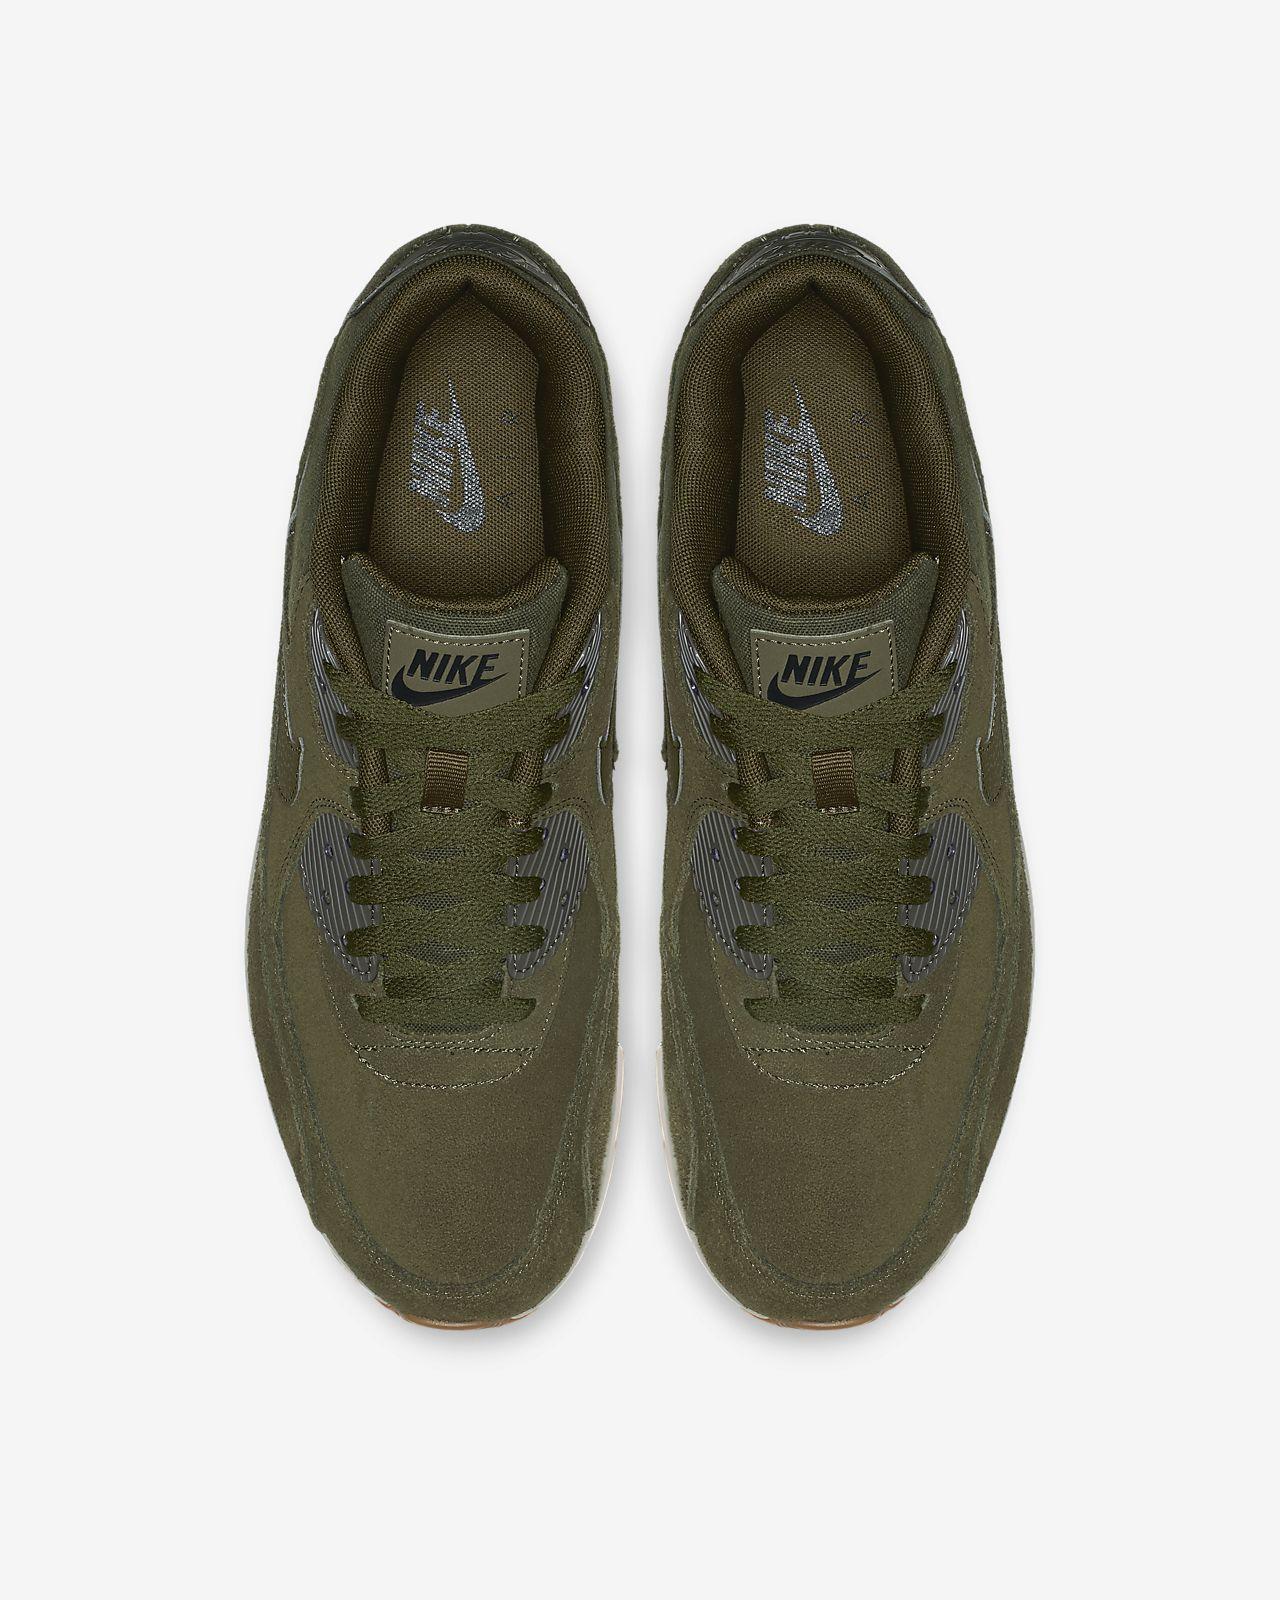 wholesale dealer 6b45e 0b3f9 ... Nike Air Max 90 Ultra 2.0 Men s Shoe